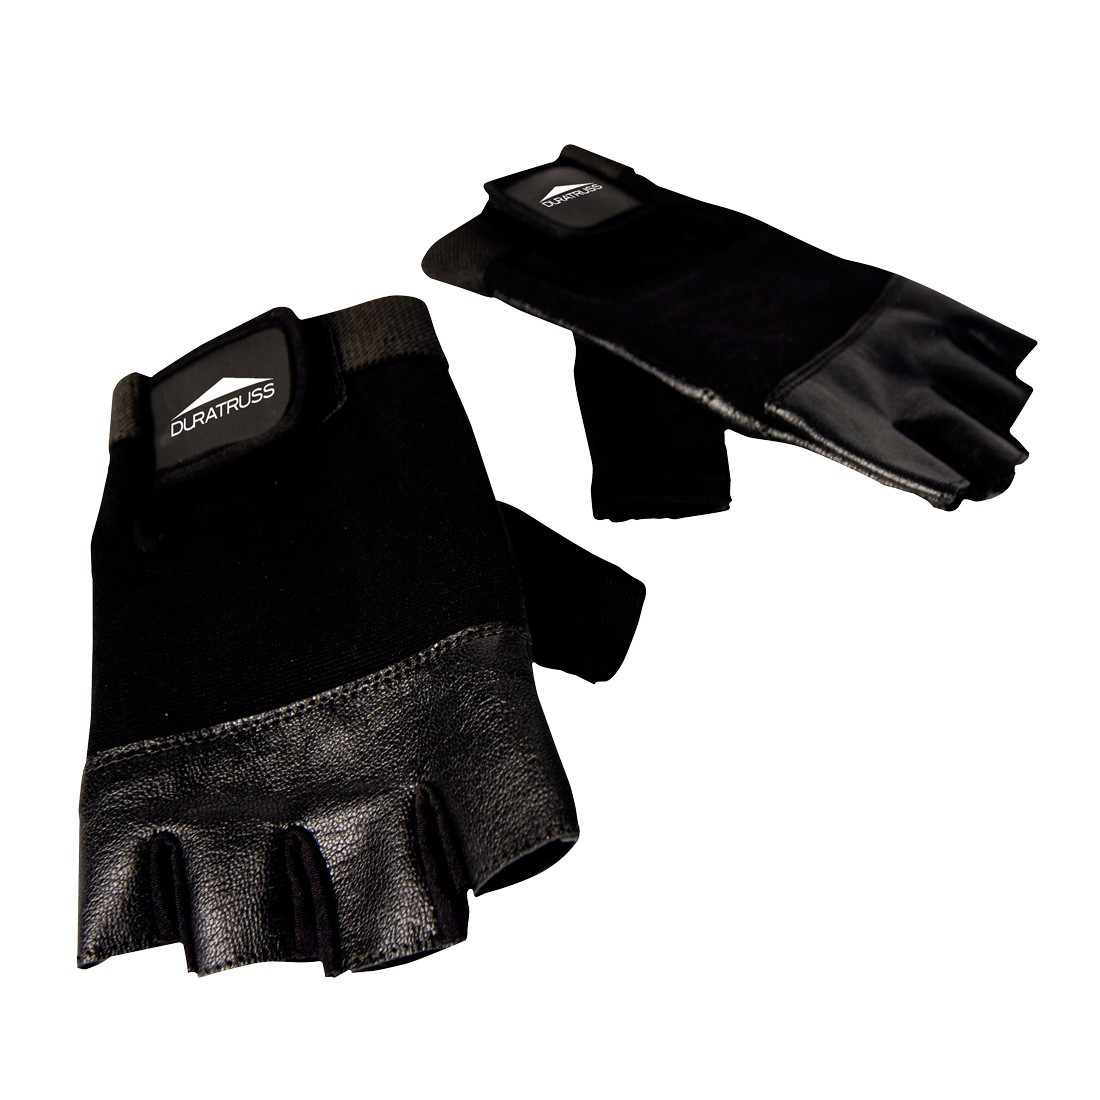 Duratruss DT Truss gloves Size: XL